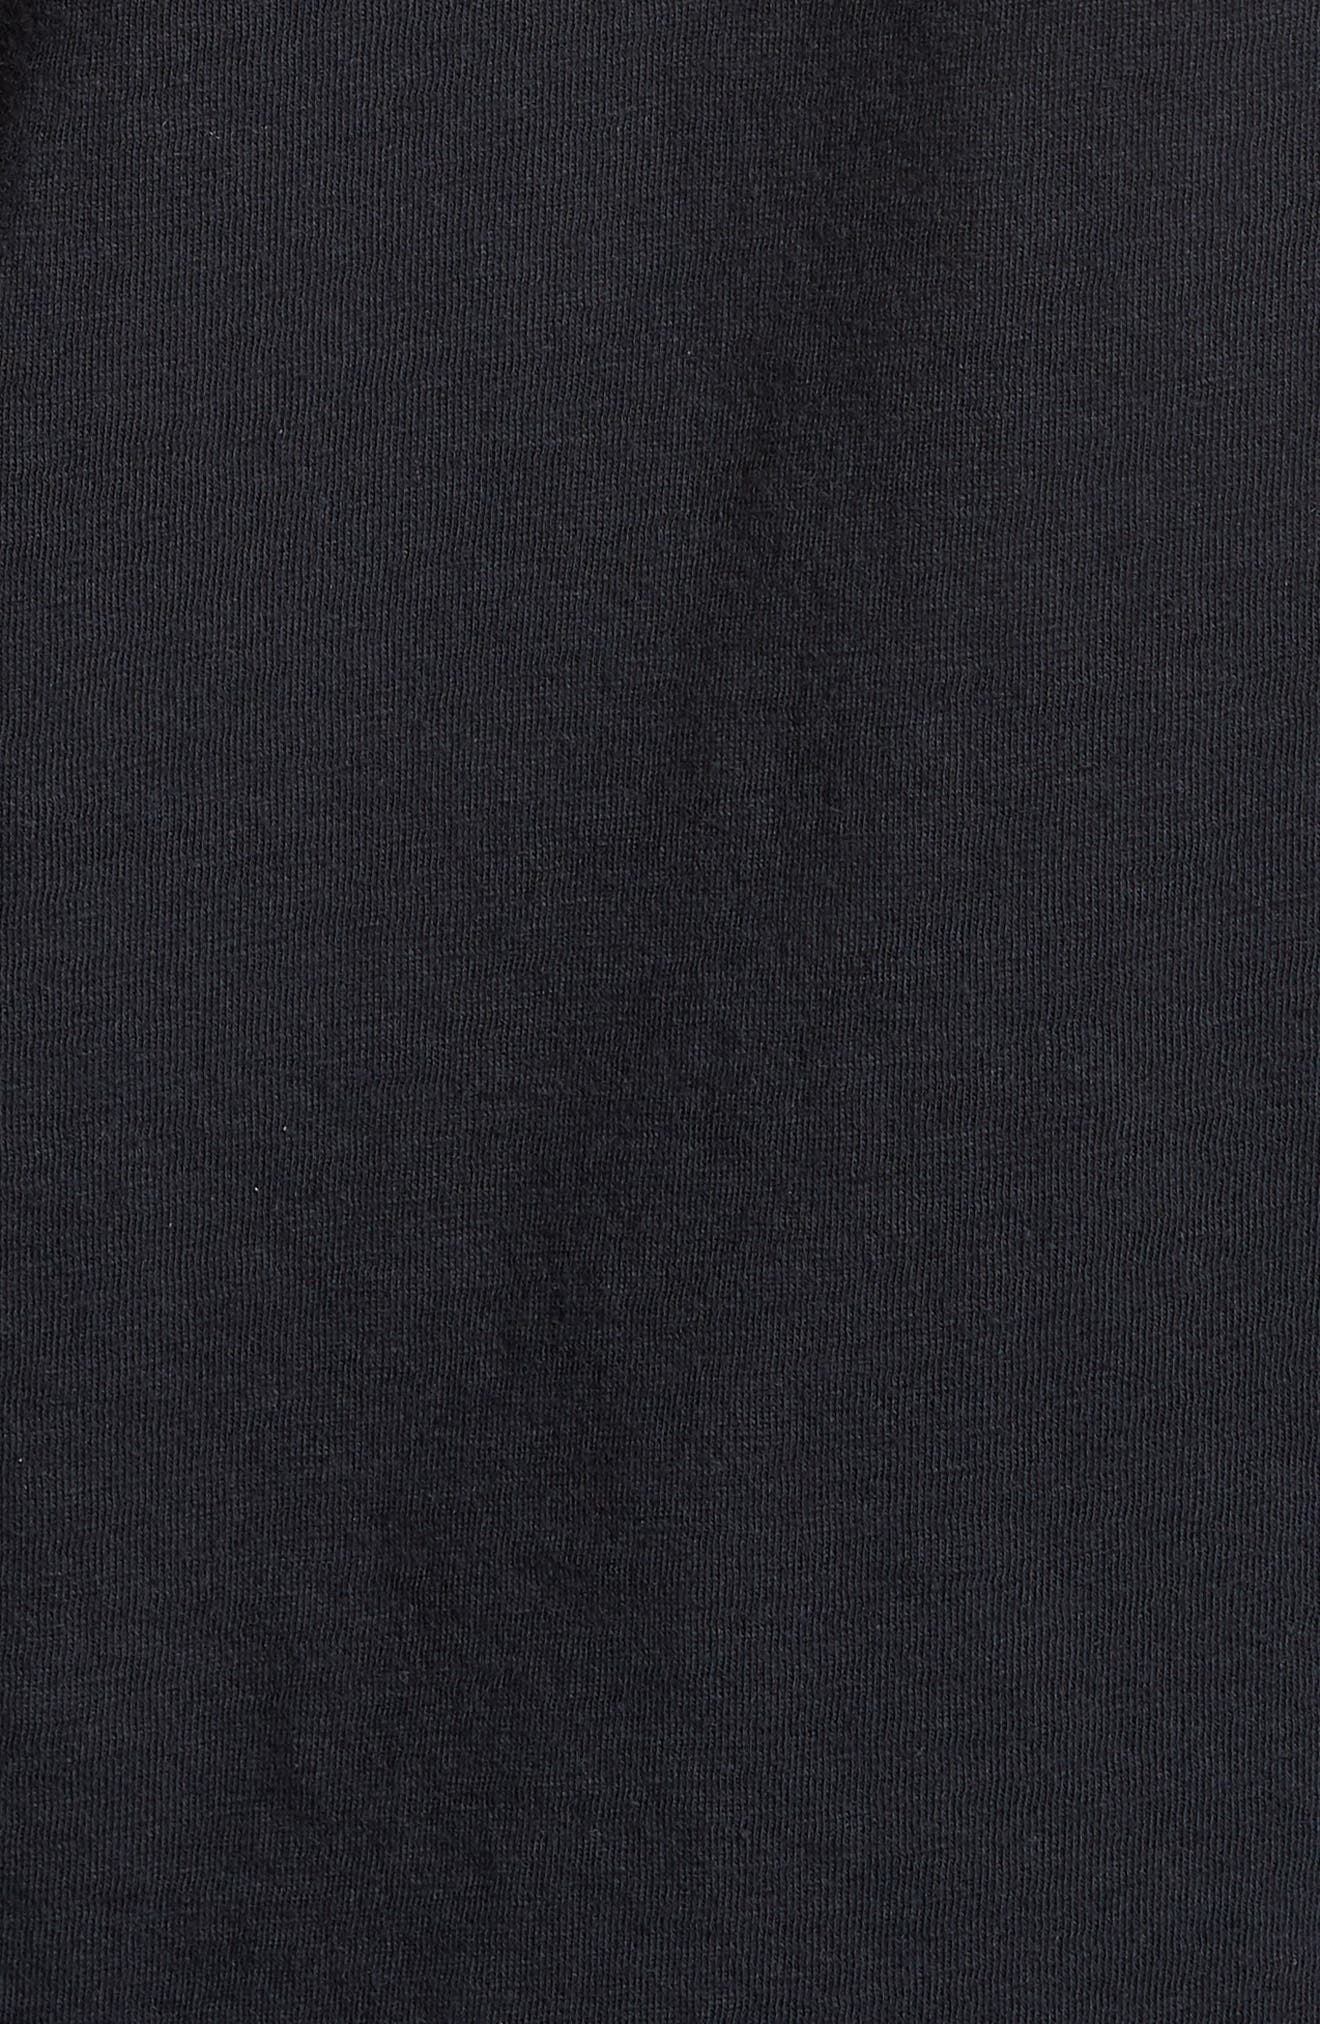 The Rolling Stones Trim Fit T-Shirt,                             Alternate thumbnail 5, color,                             001